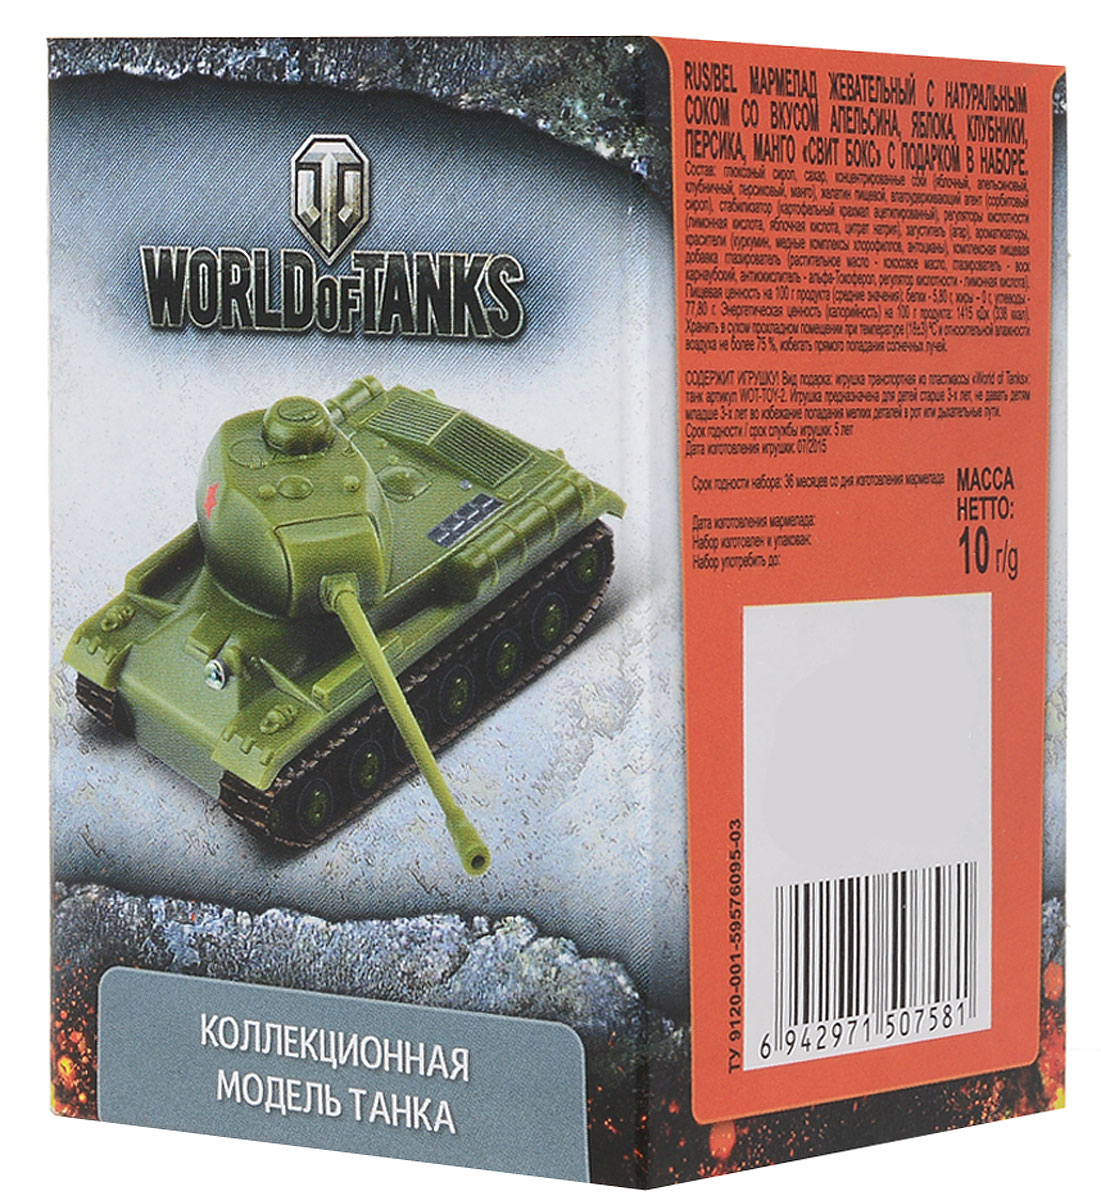 Свитбокс World of Tanks мармелад с игрушкой, 10 г sweet box пони на ладони мармелад жевательный с игрушкой 10 г